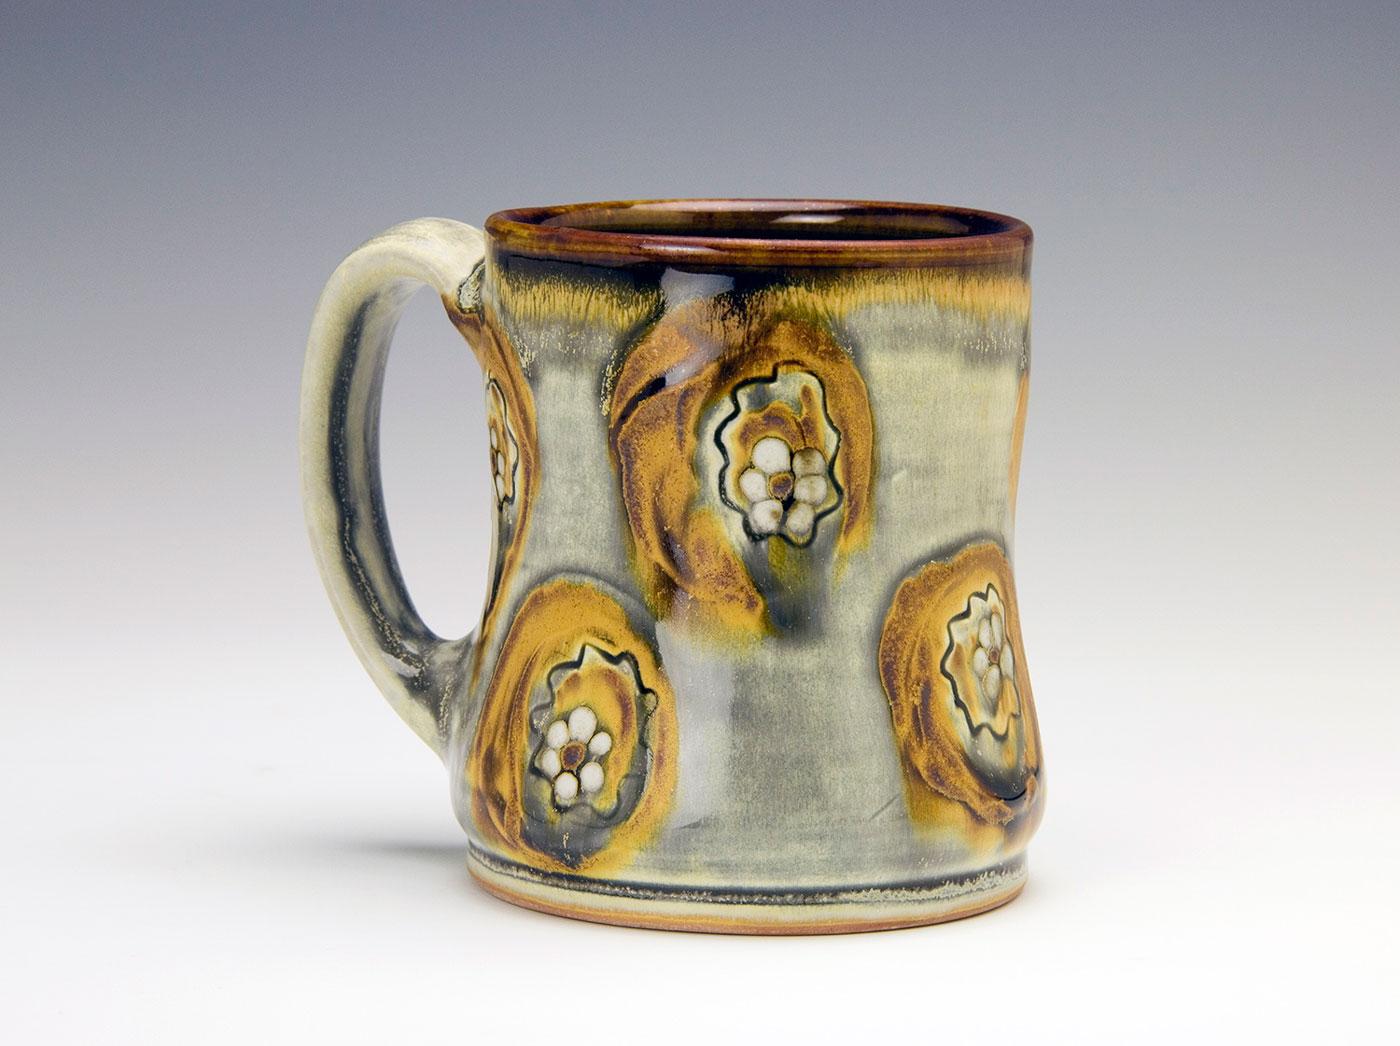 Moka-bronze-abstract-leaves-contemporary-clay-mug-Samantha-Henneke-Seagrove-Pottery.jpg